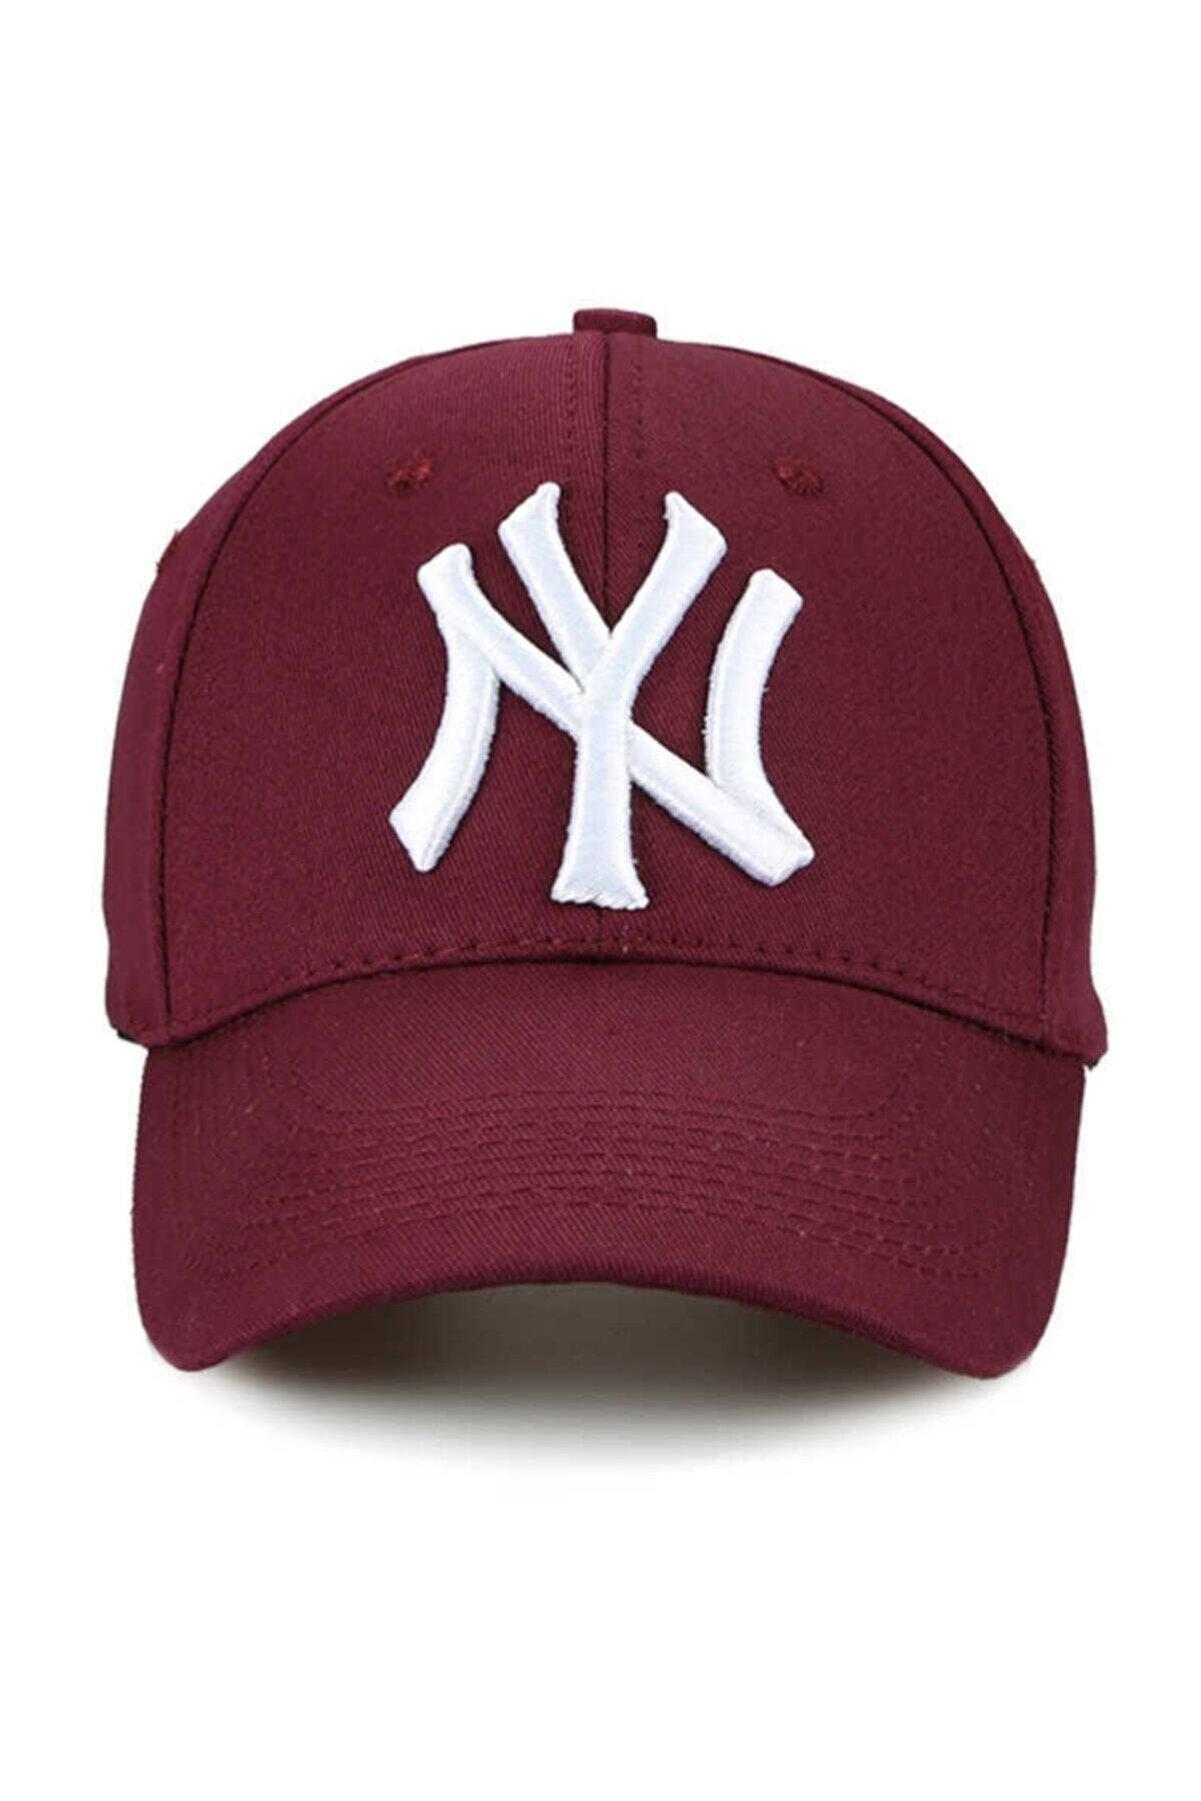 Orçun Özkarlıklı Unisex Bordo Ny Şapka